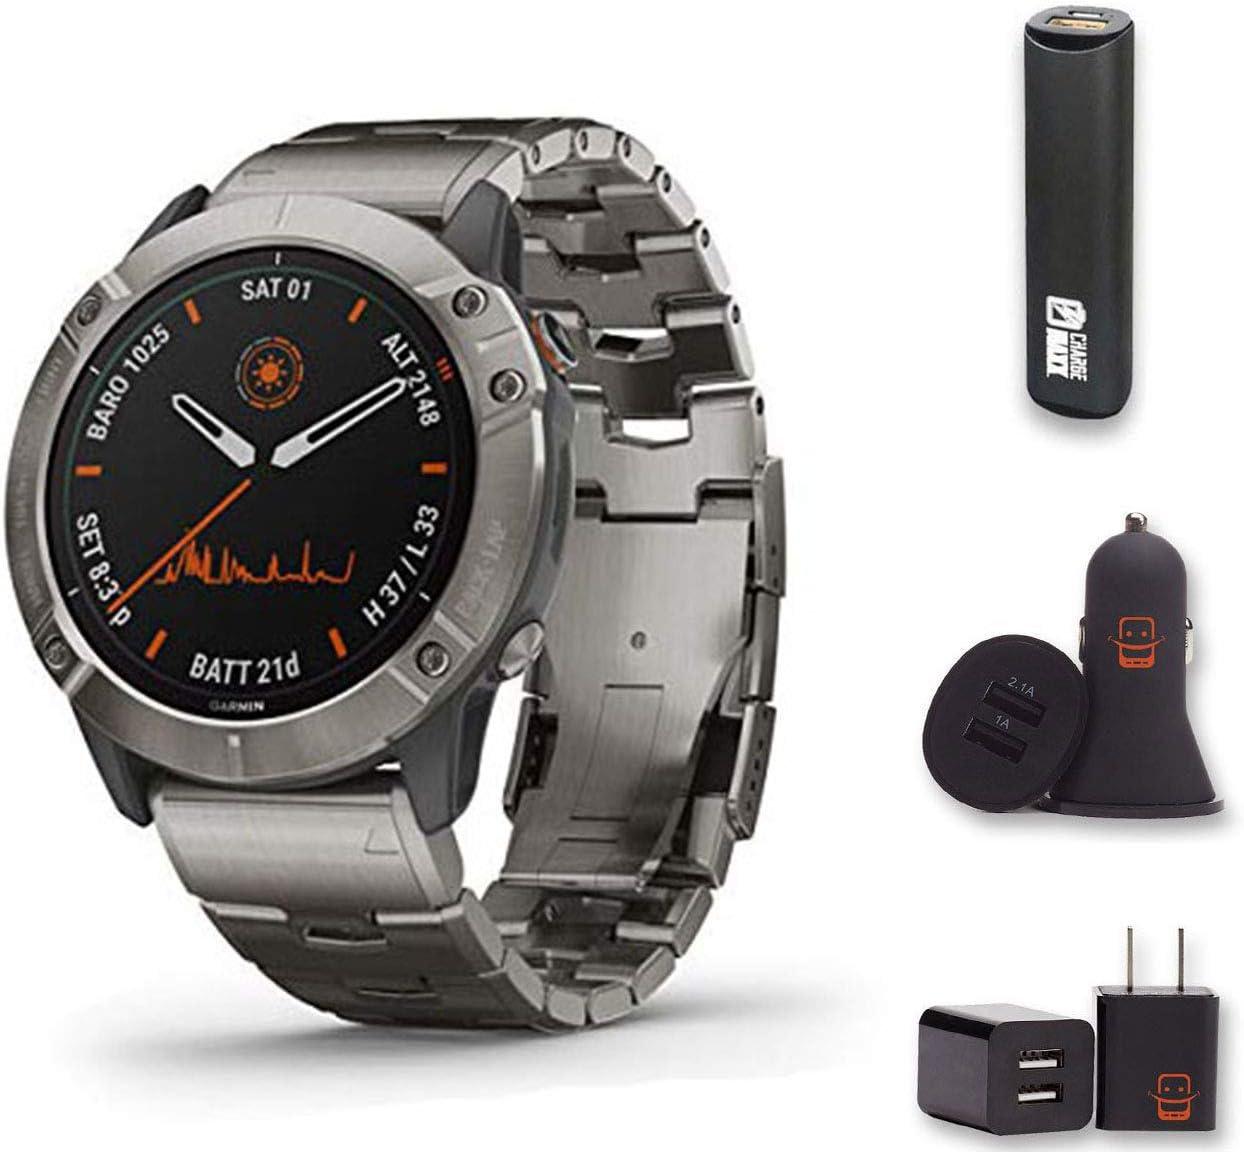 Garmin Fenix 6X Pro Solar - (Dary Gray w/Black Band) Bundle with PowerBank + USB Car Charger + USB Wall Charger (4 Items)